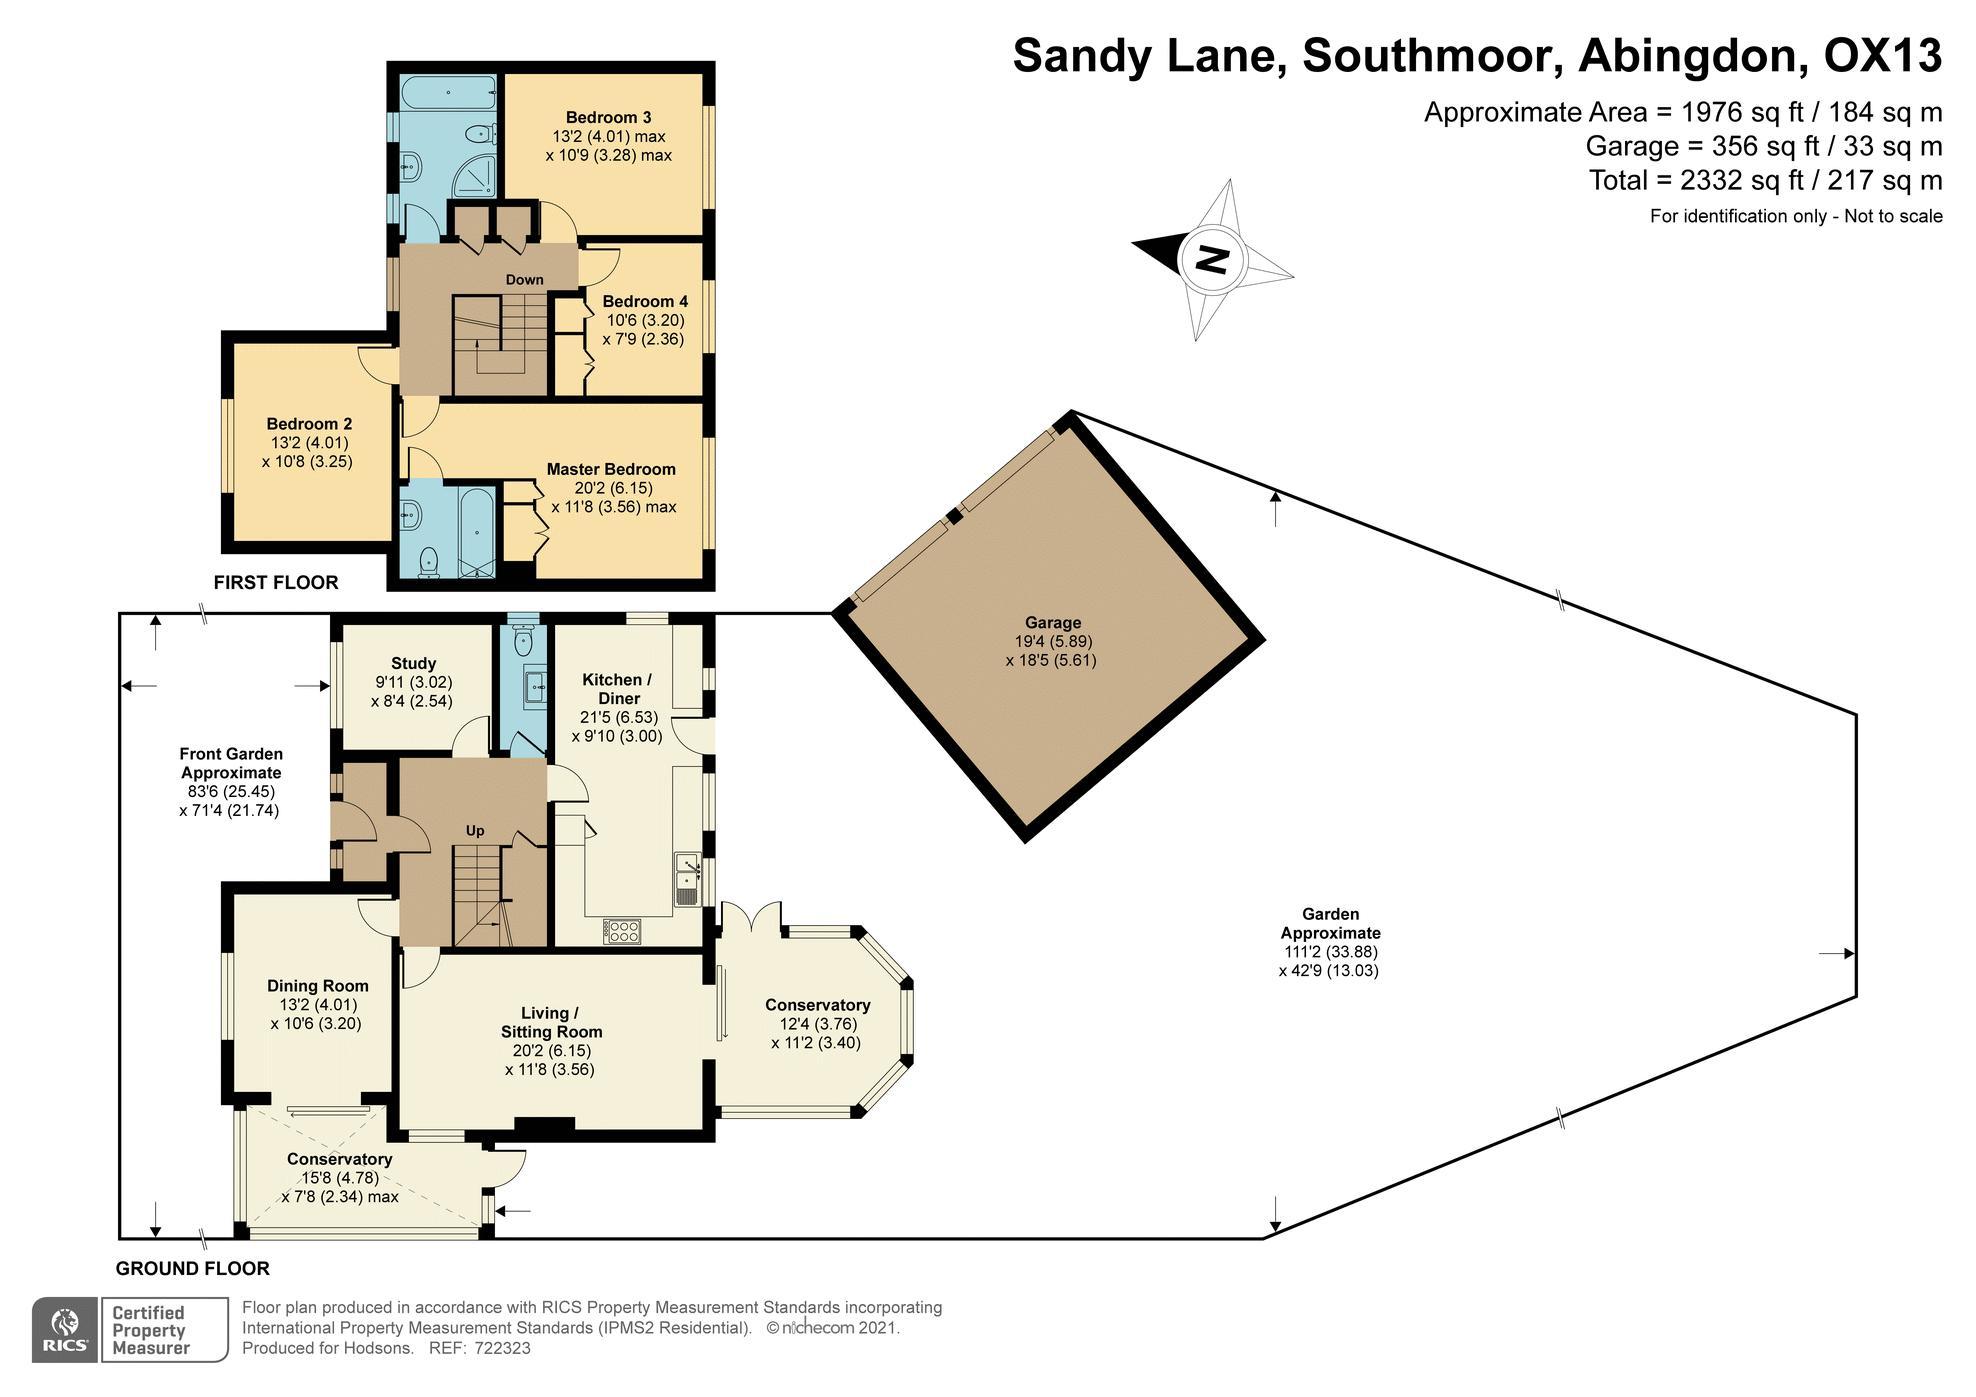 Sandy Lane Southmoor